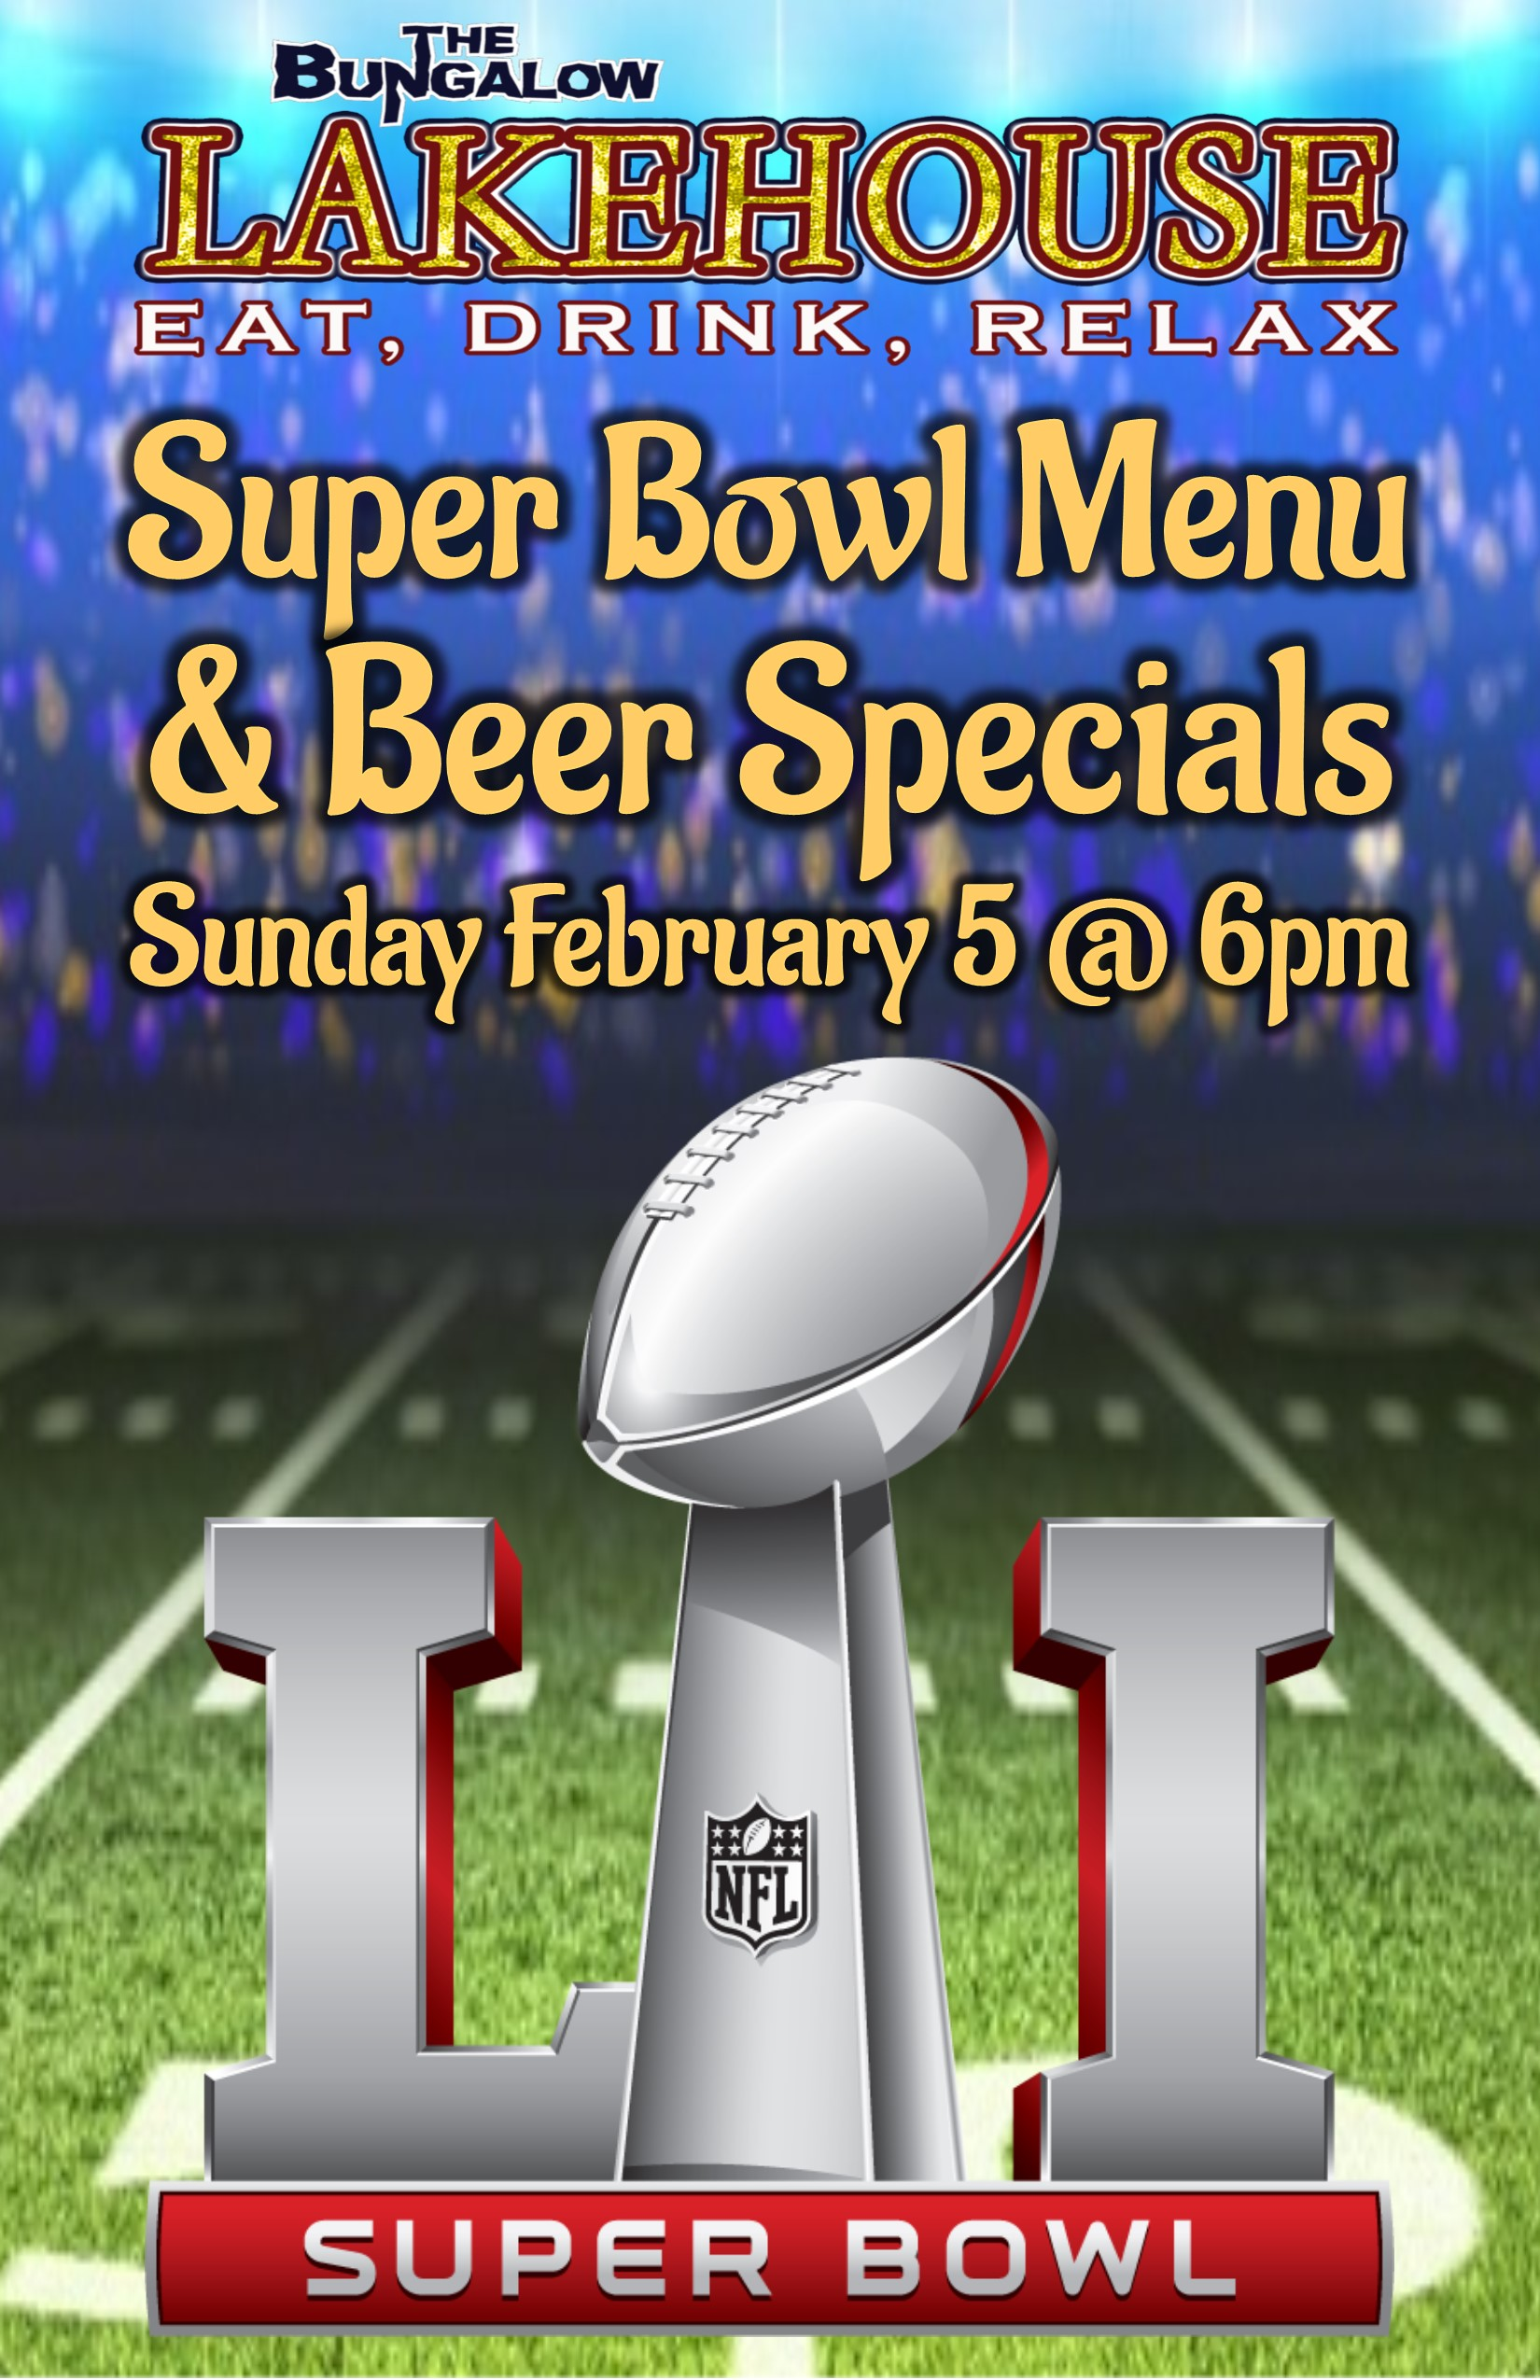 Super Bowl 51 LH 11x17